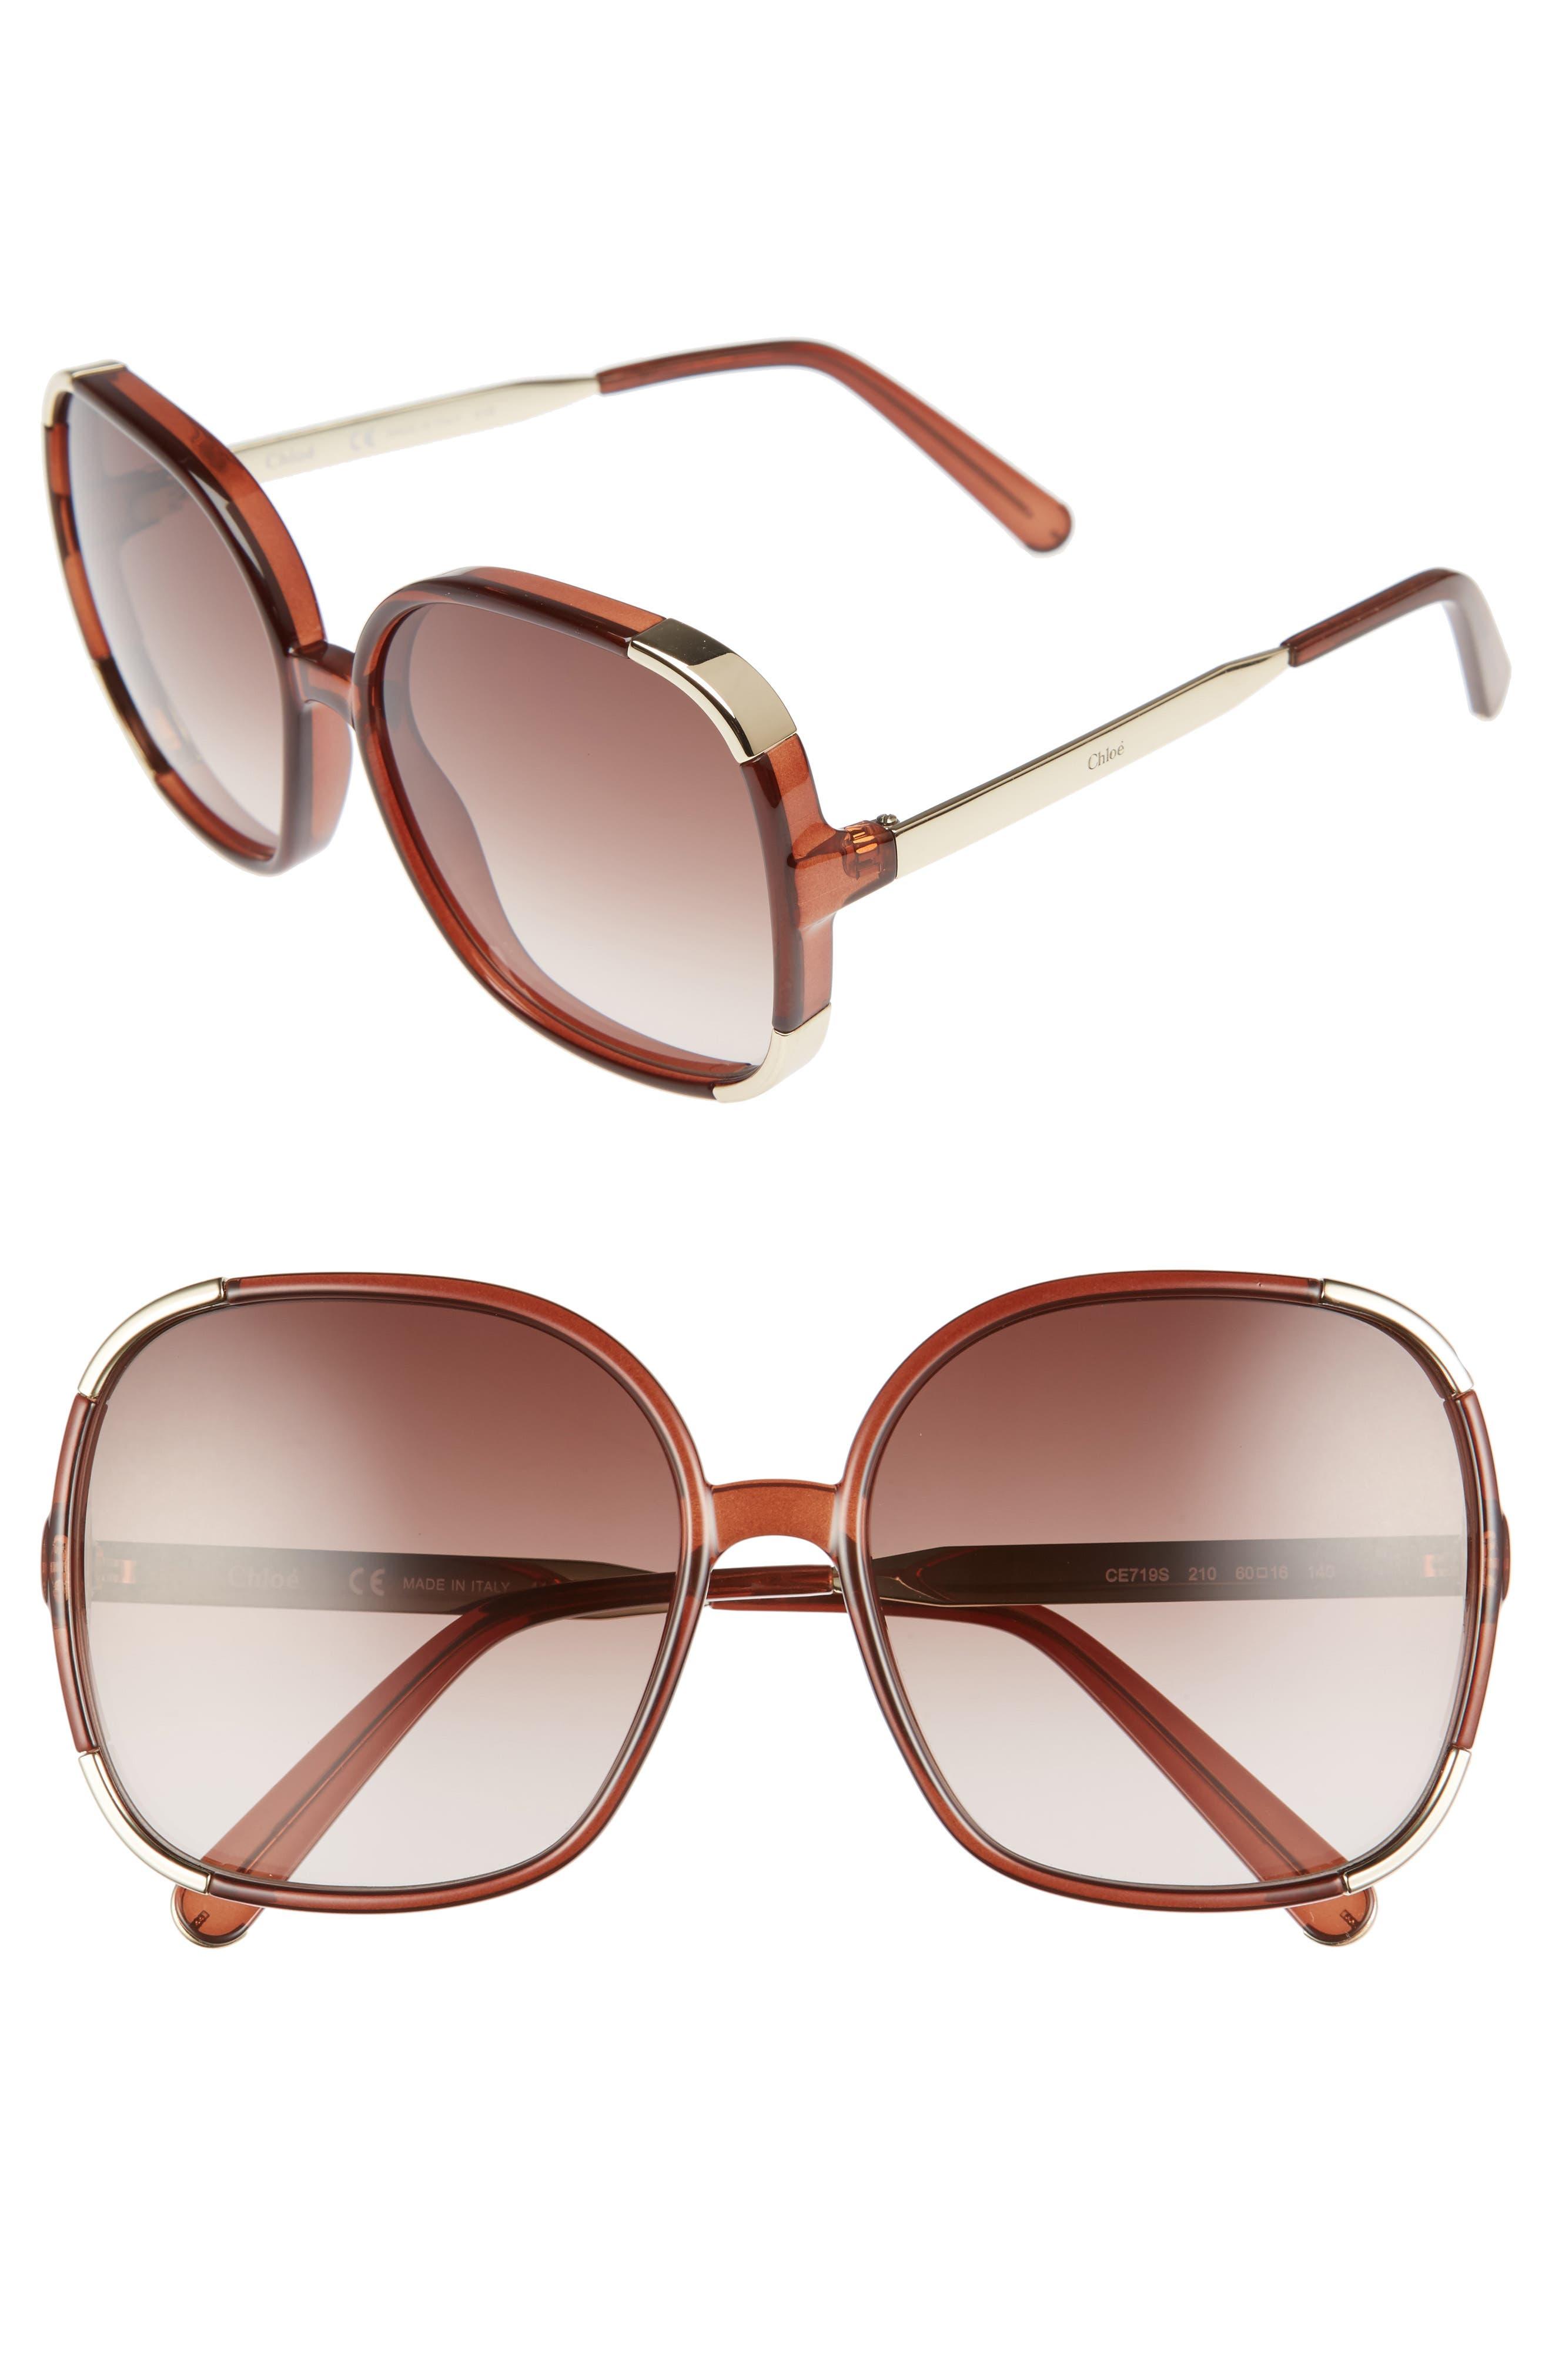 Alternate Image 1 Selected - Chloé Myrte 61mm Gradient Lens Square Sunglasses